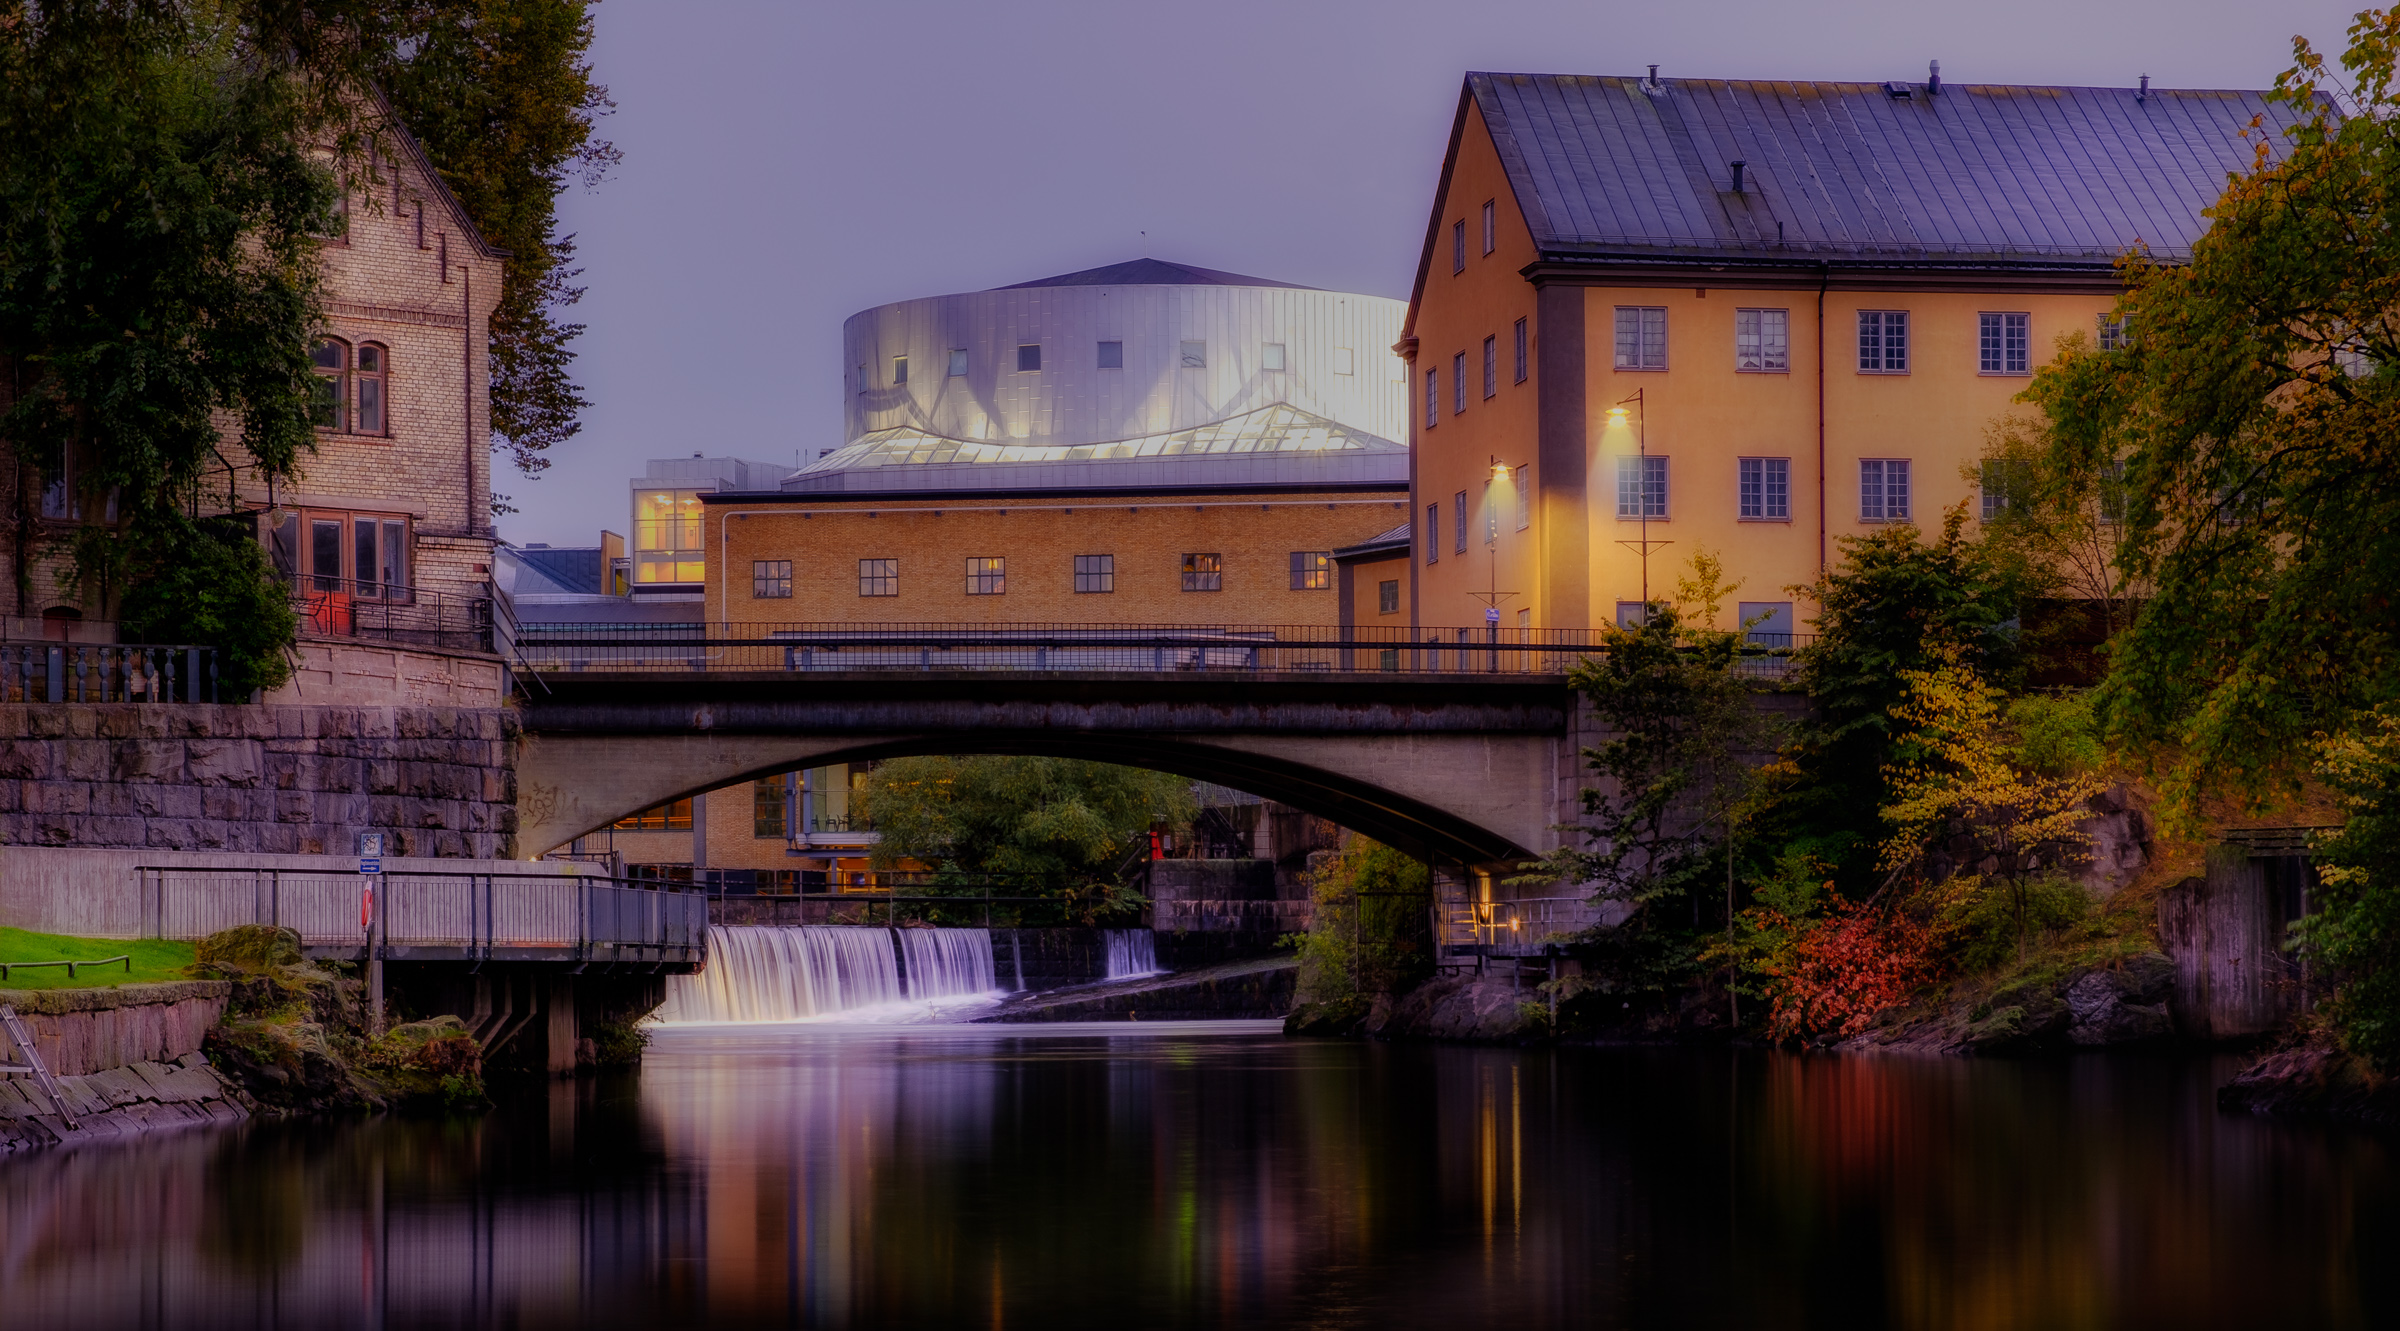 171007-norrköping-photowalk-4-Redigera.jpg